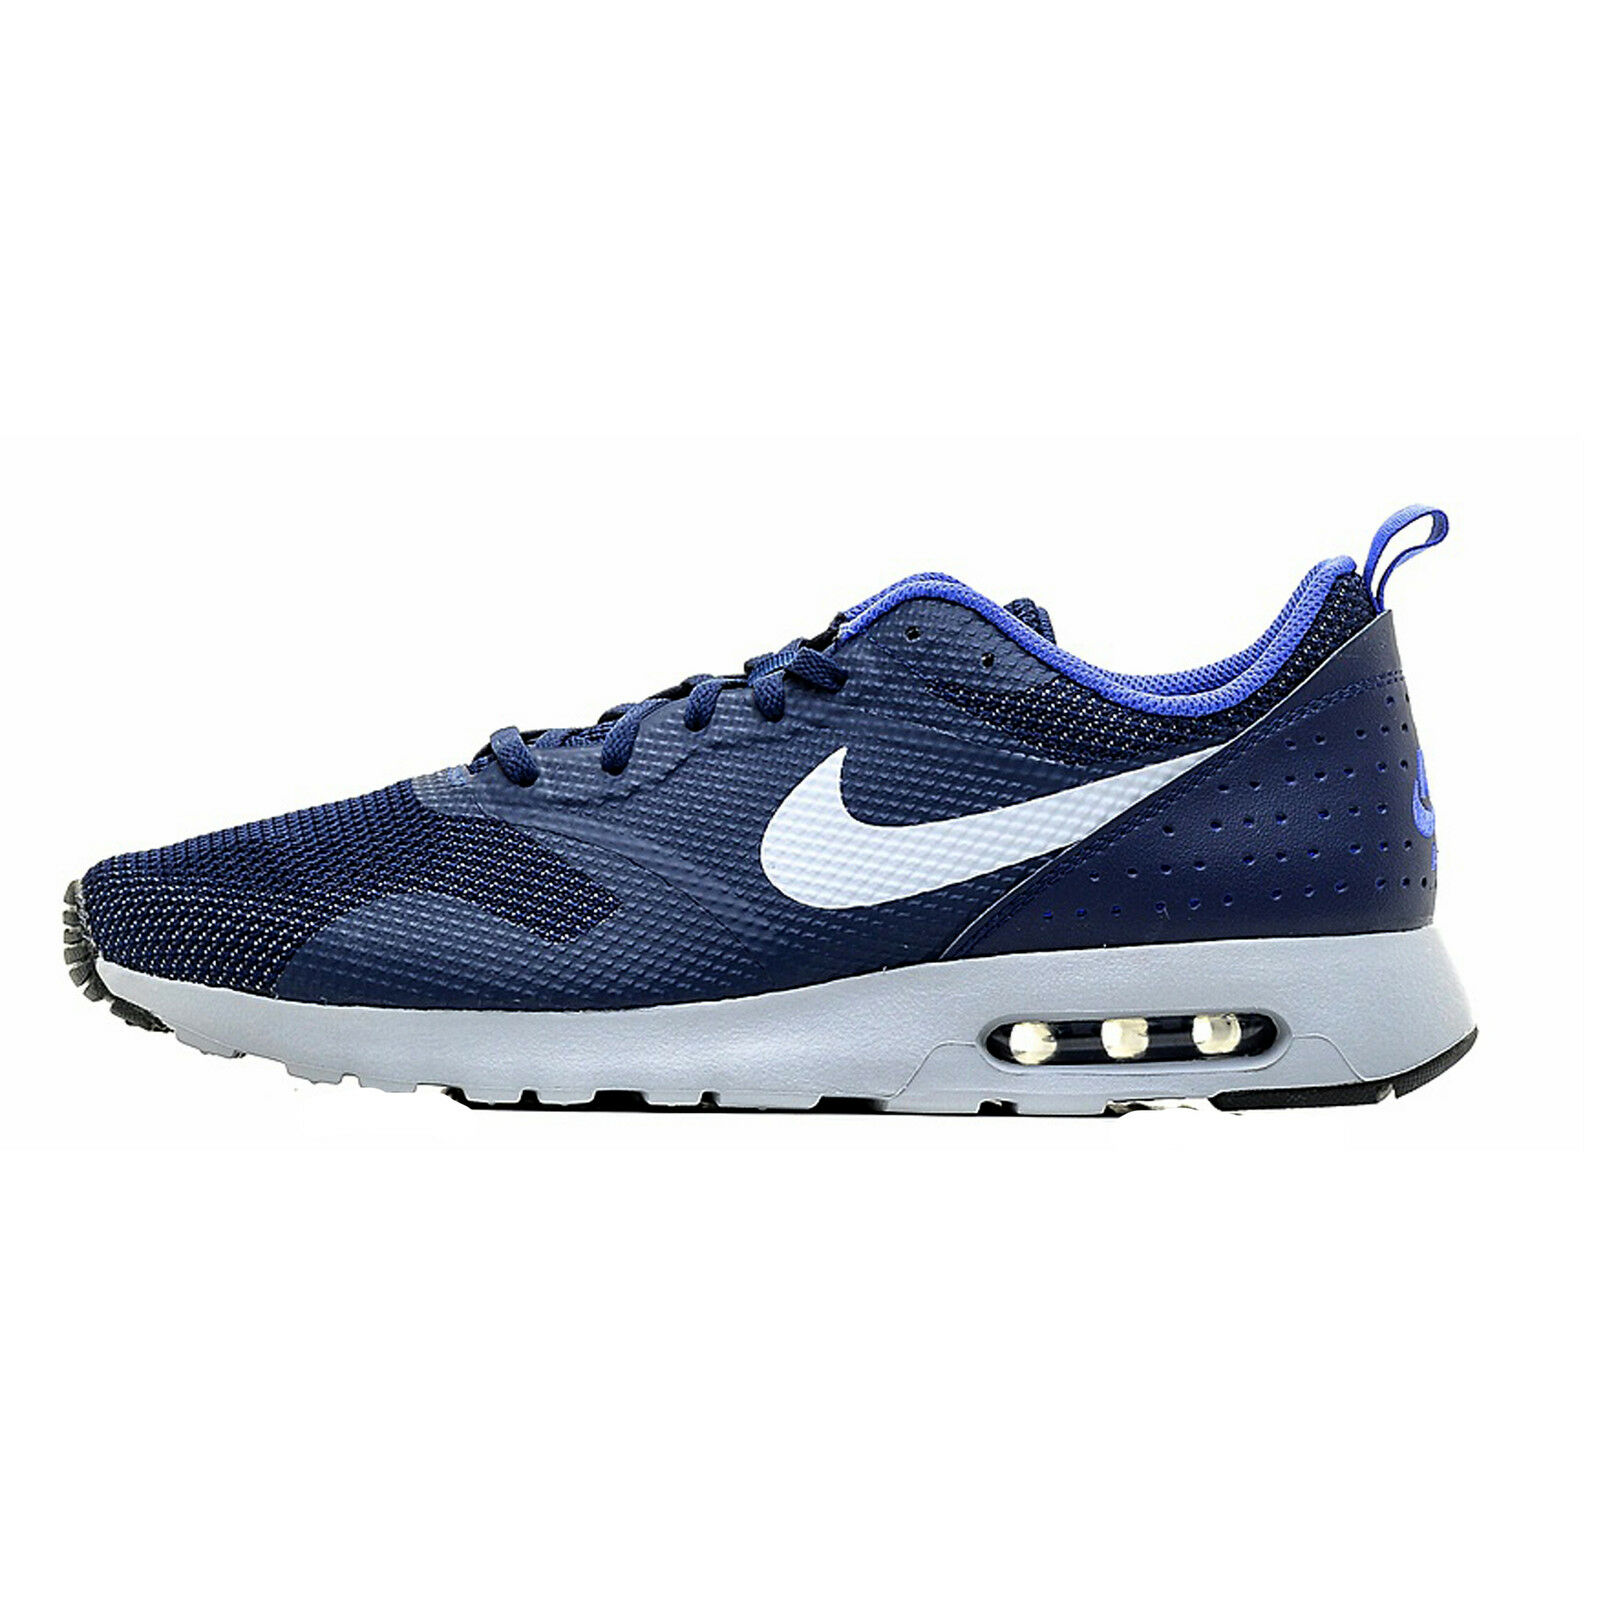 NIKE Air Max Tavas 705149-408 Sneaker Freizeit Schuh Great discount